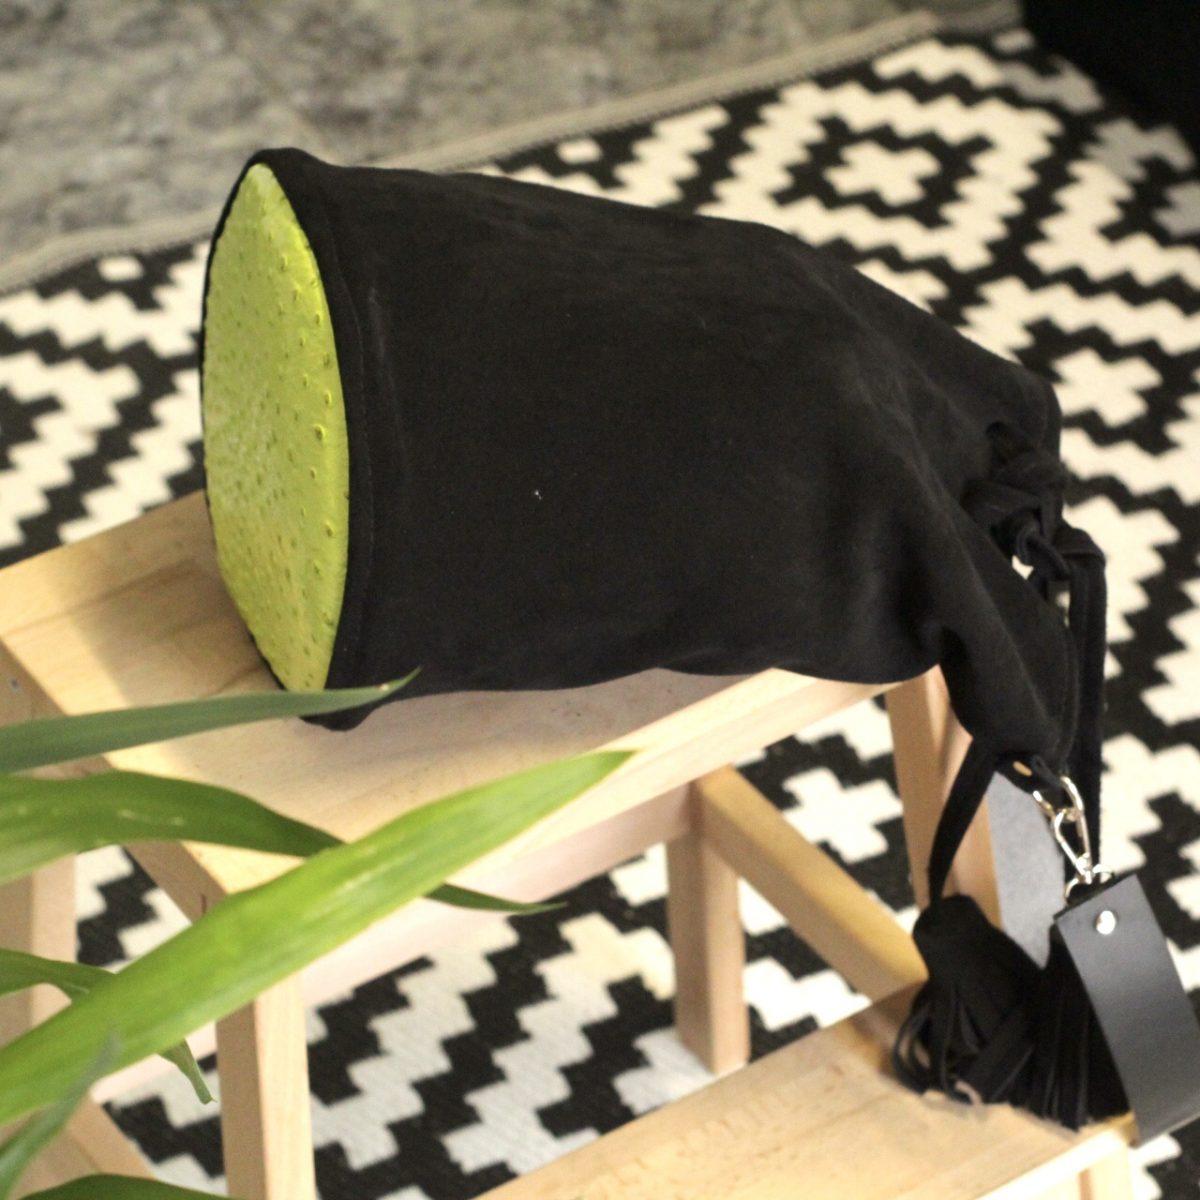 Bolso tipo saco en piel serraje negra sostenible de estilo bohemio